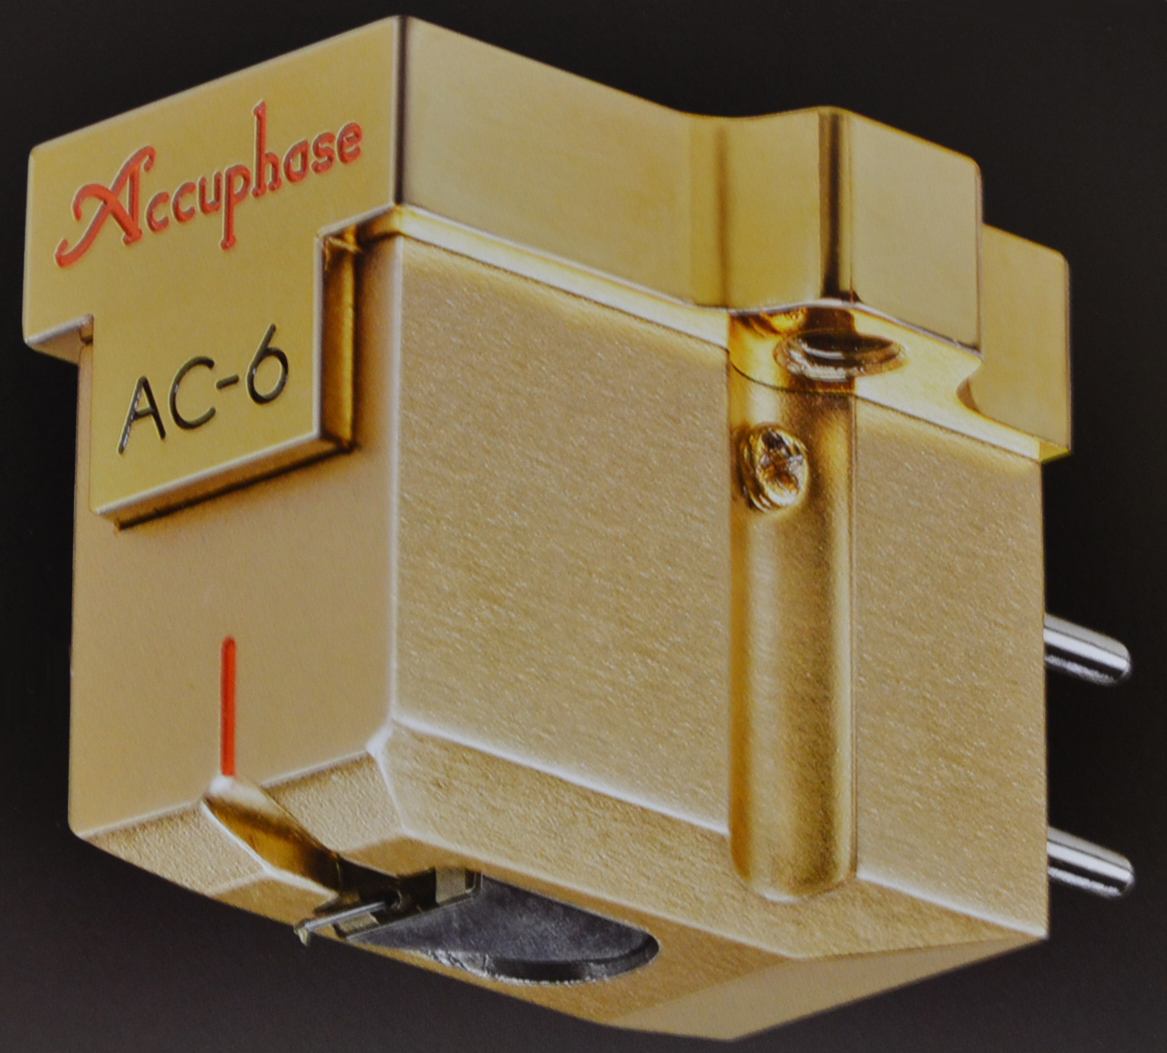 Accuphase(アキュフェーズ) AC-6 MC型フォノ・カートリッジ